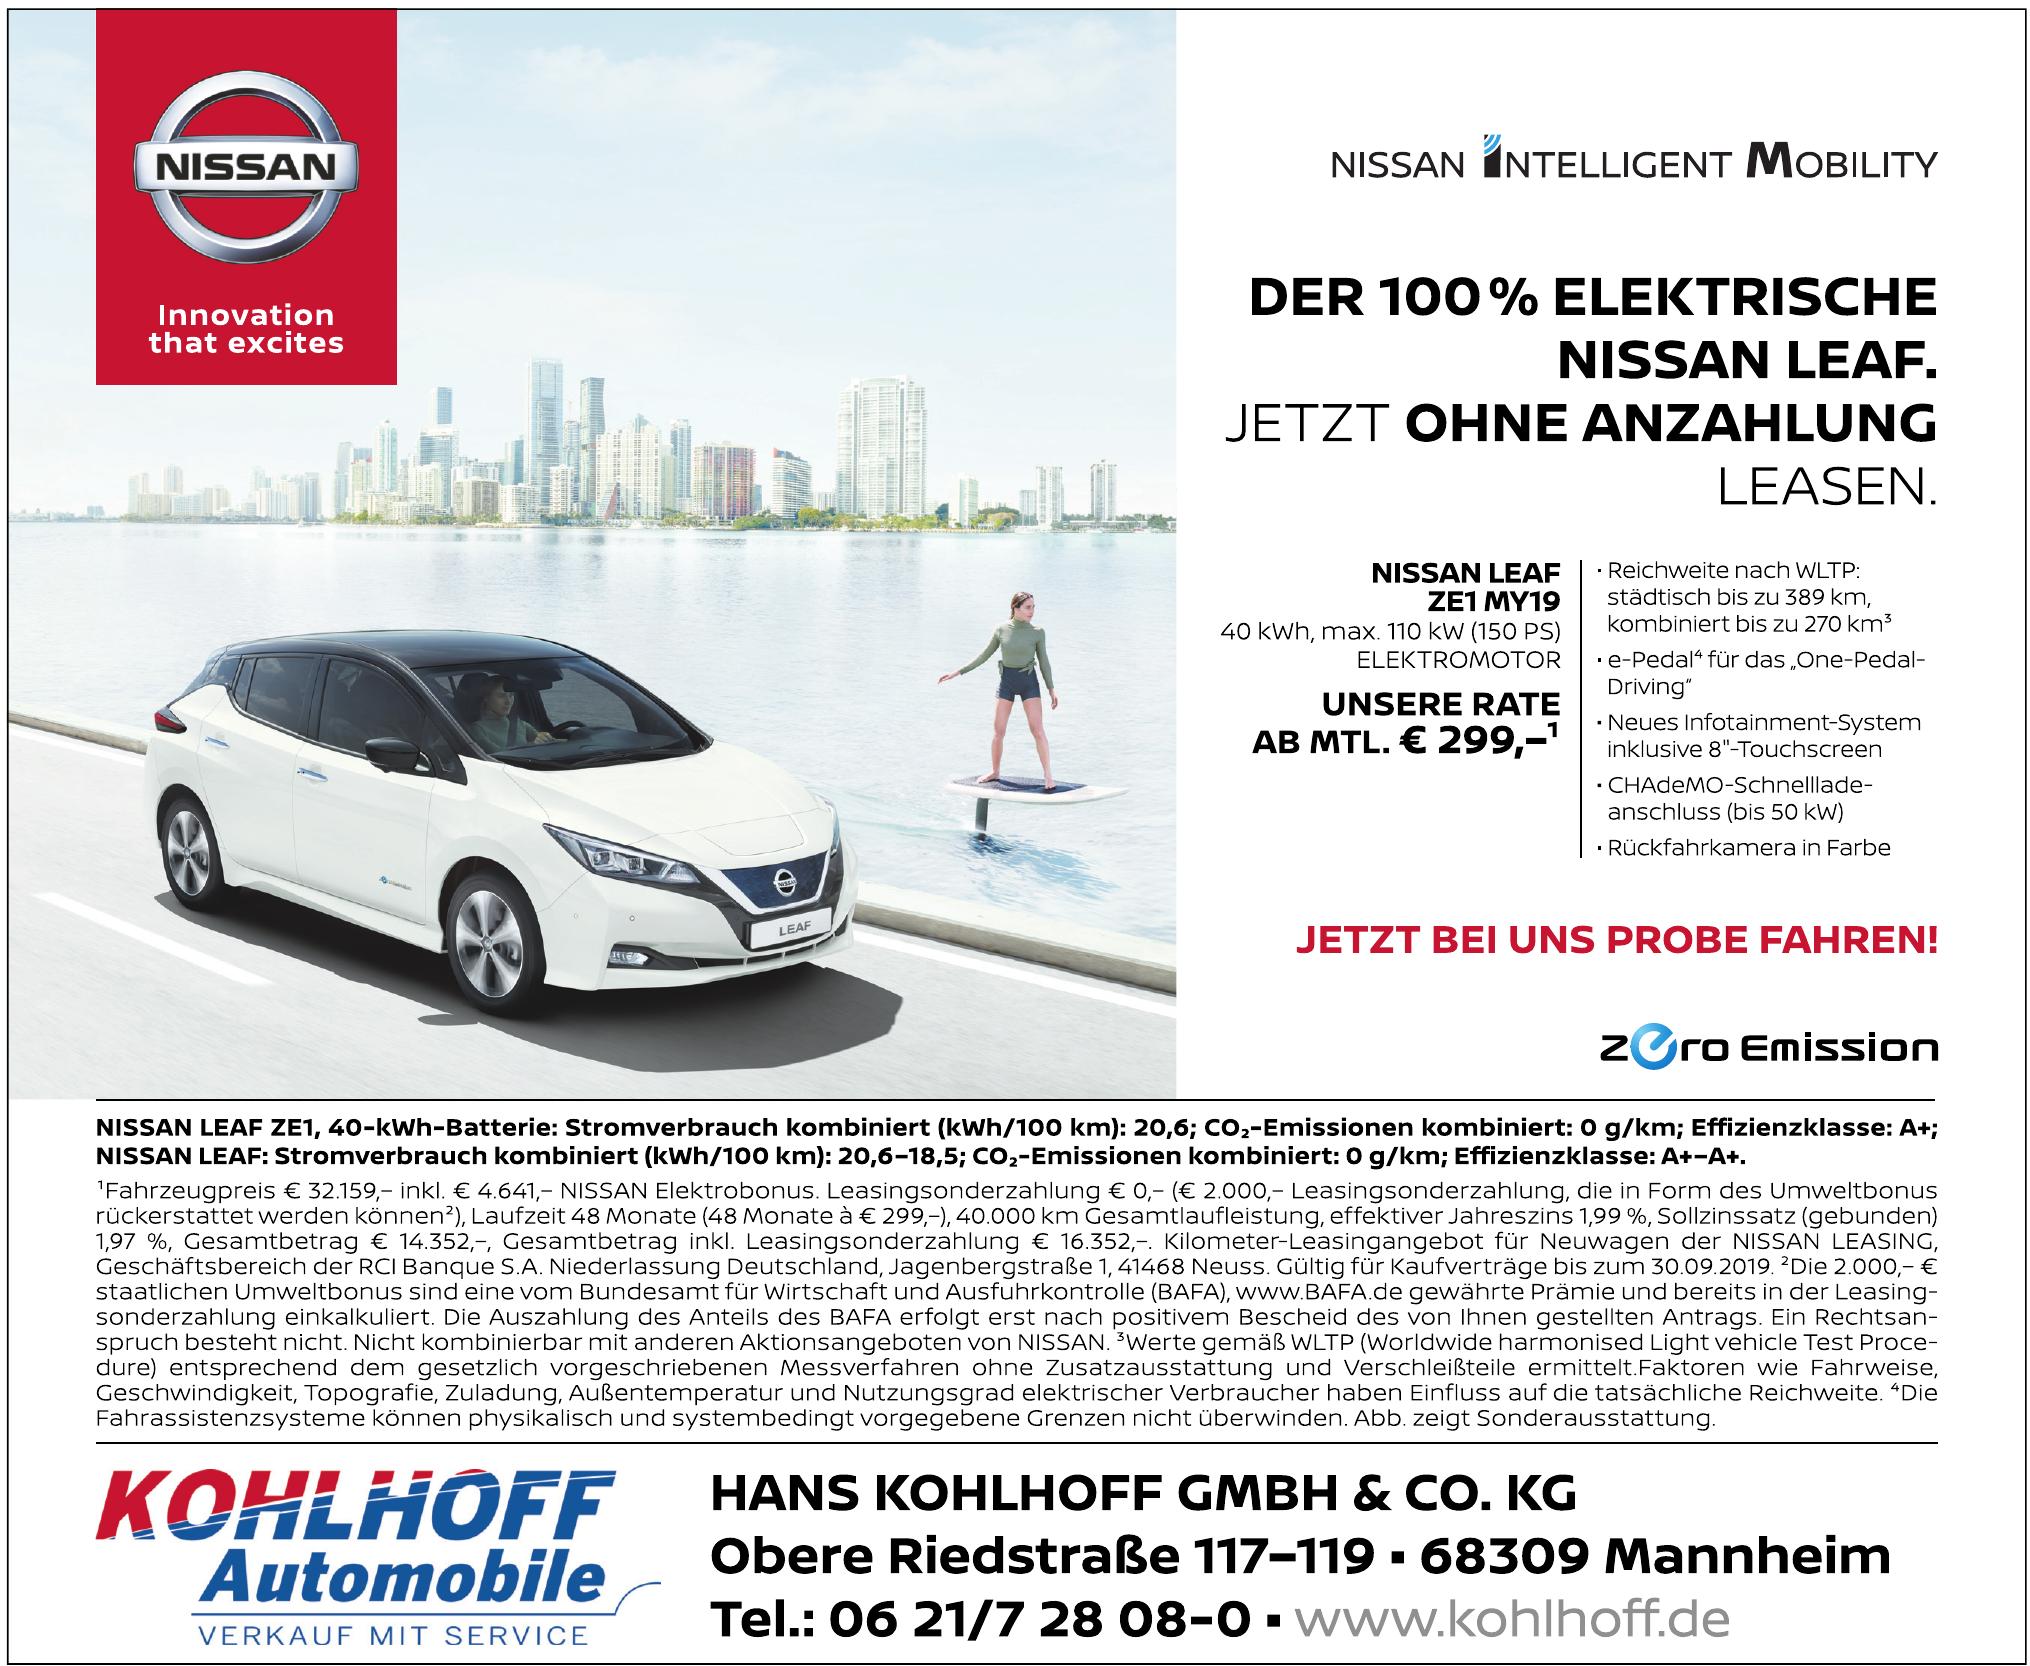 Hans Kohlhoff GmbH & Co. KG